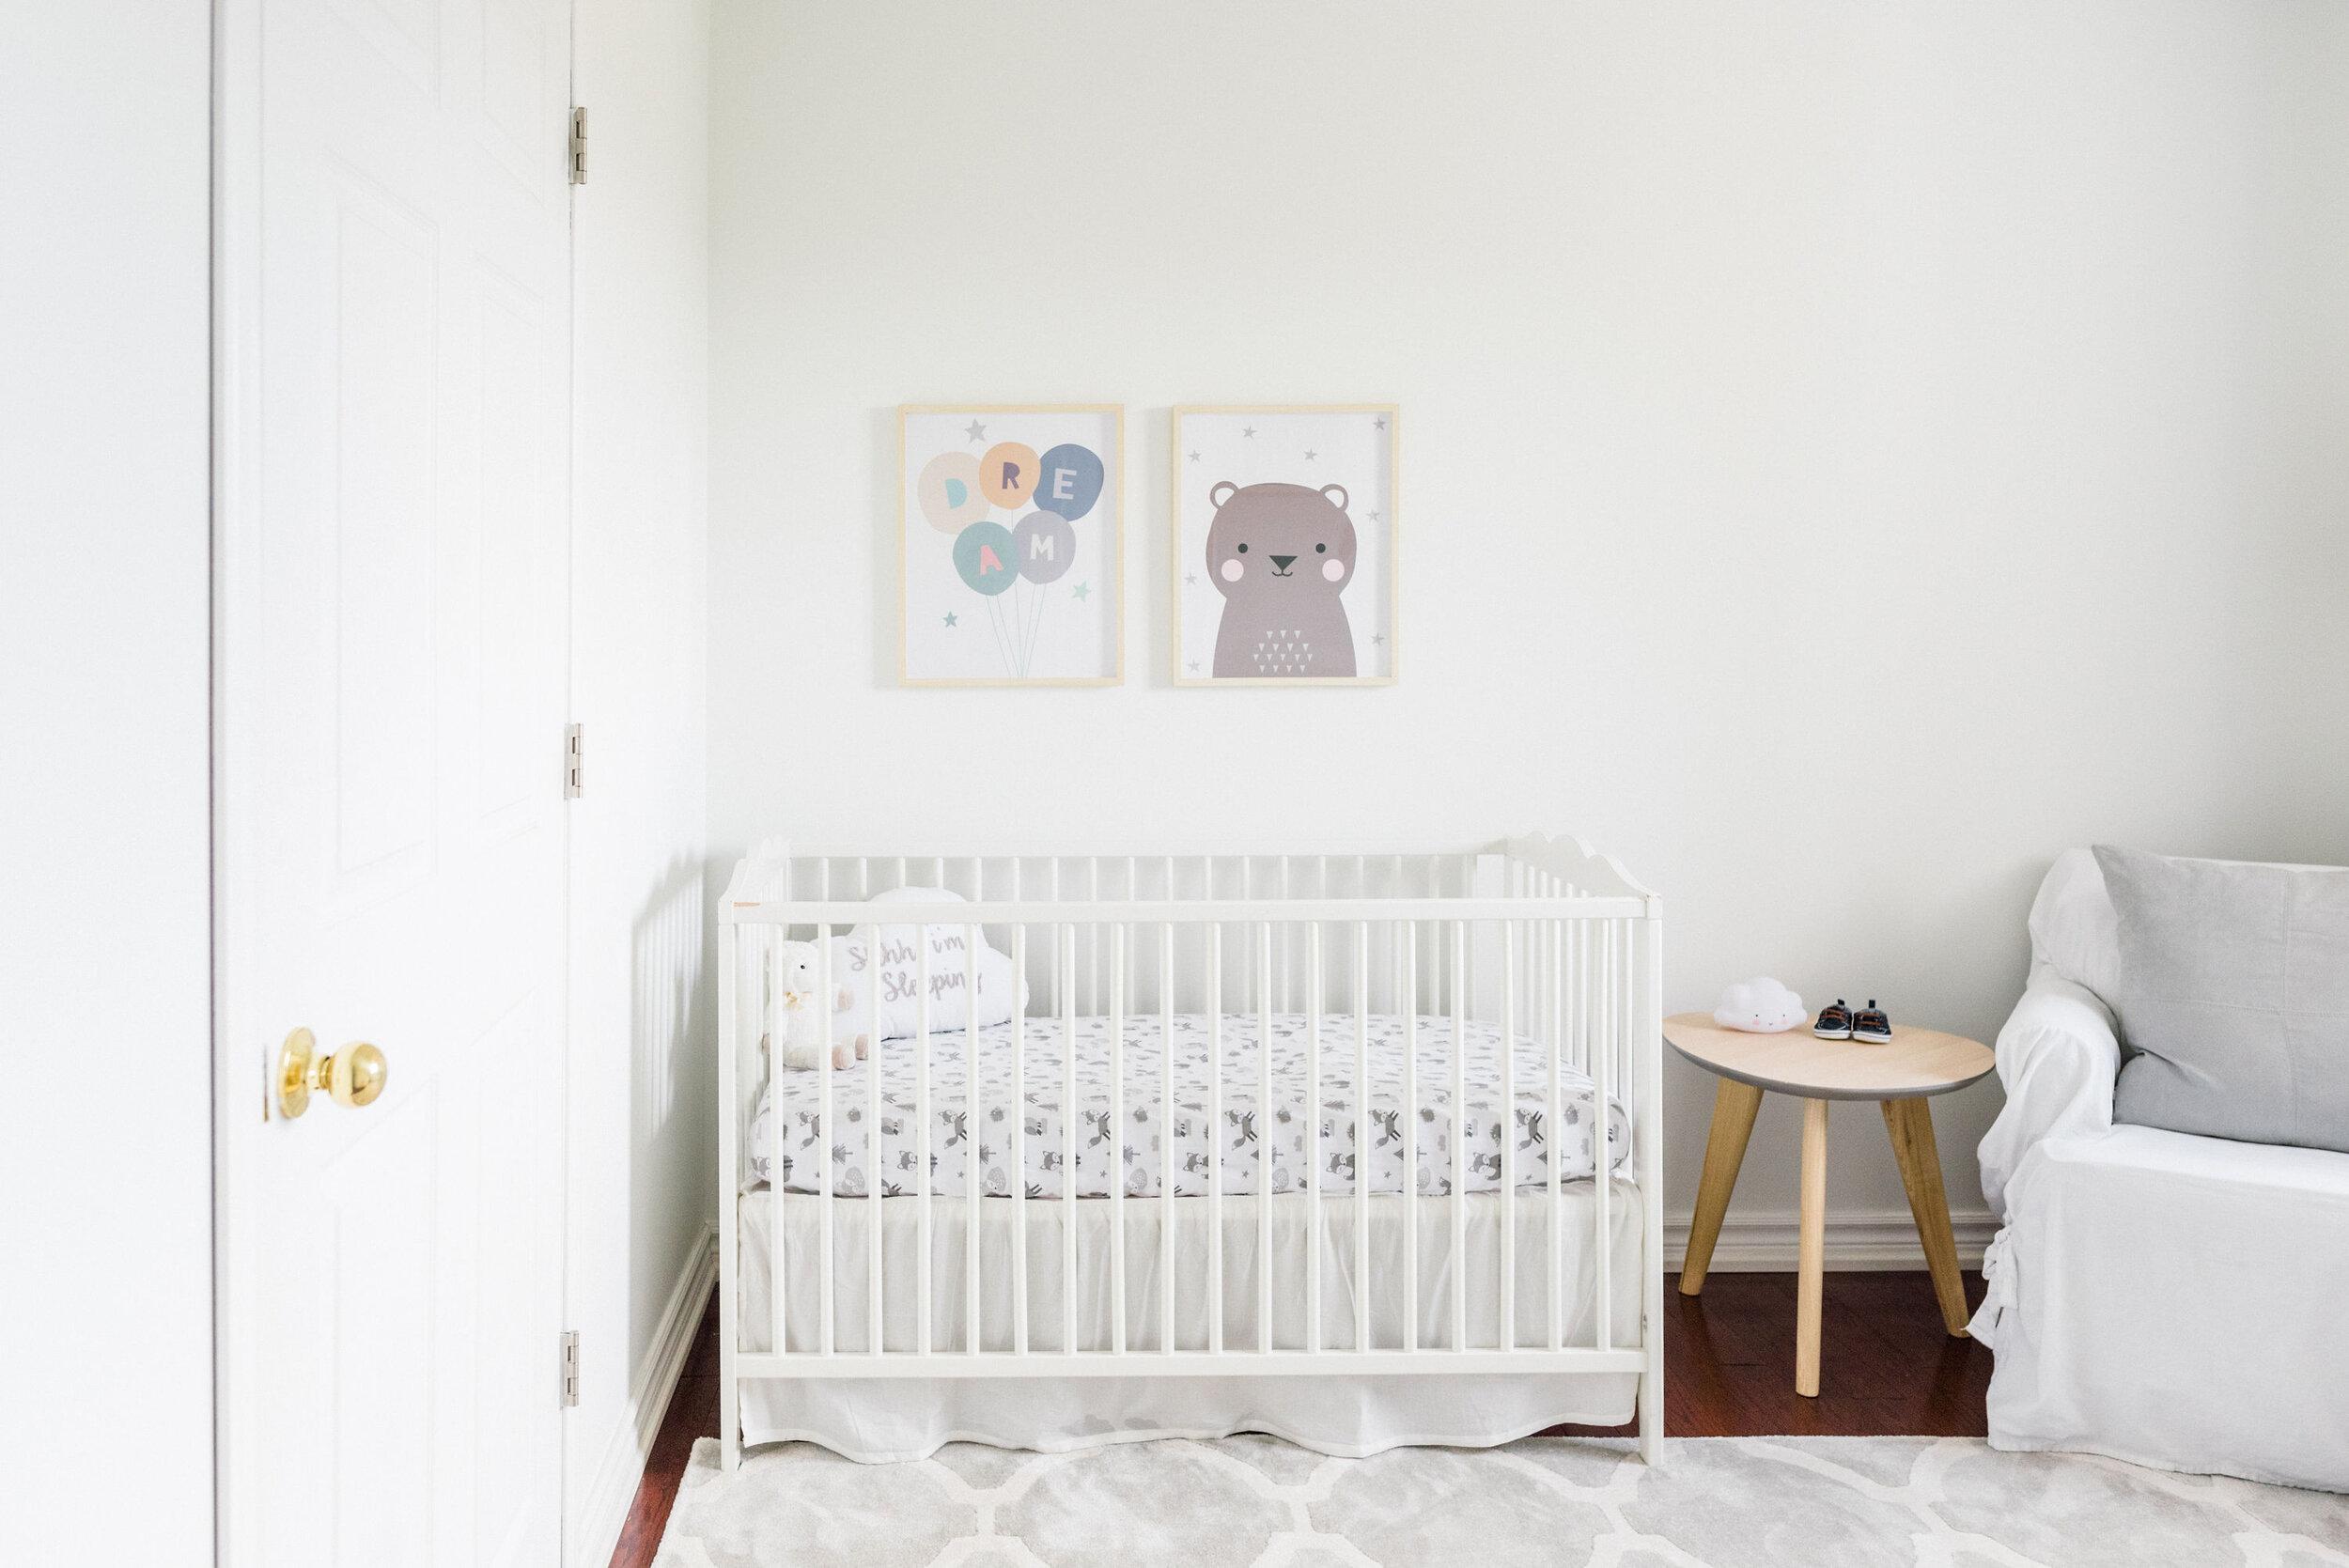 leann-ban-interior-nursery-3.jpg